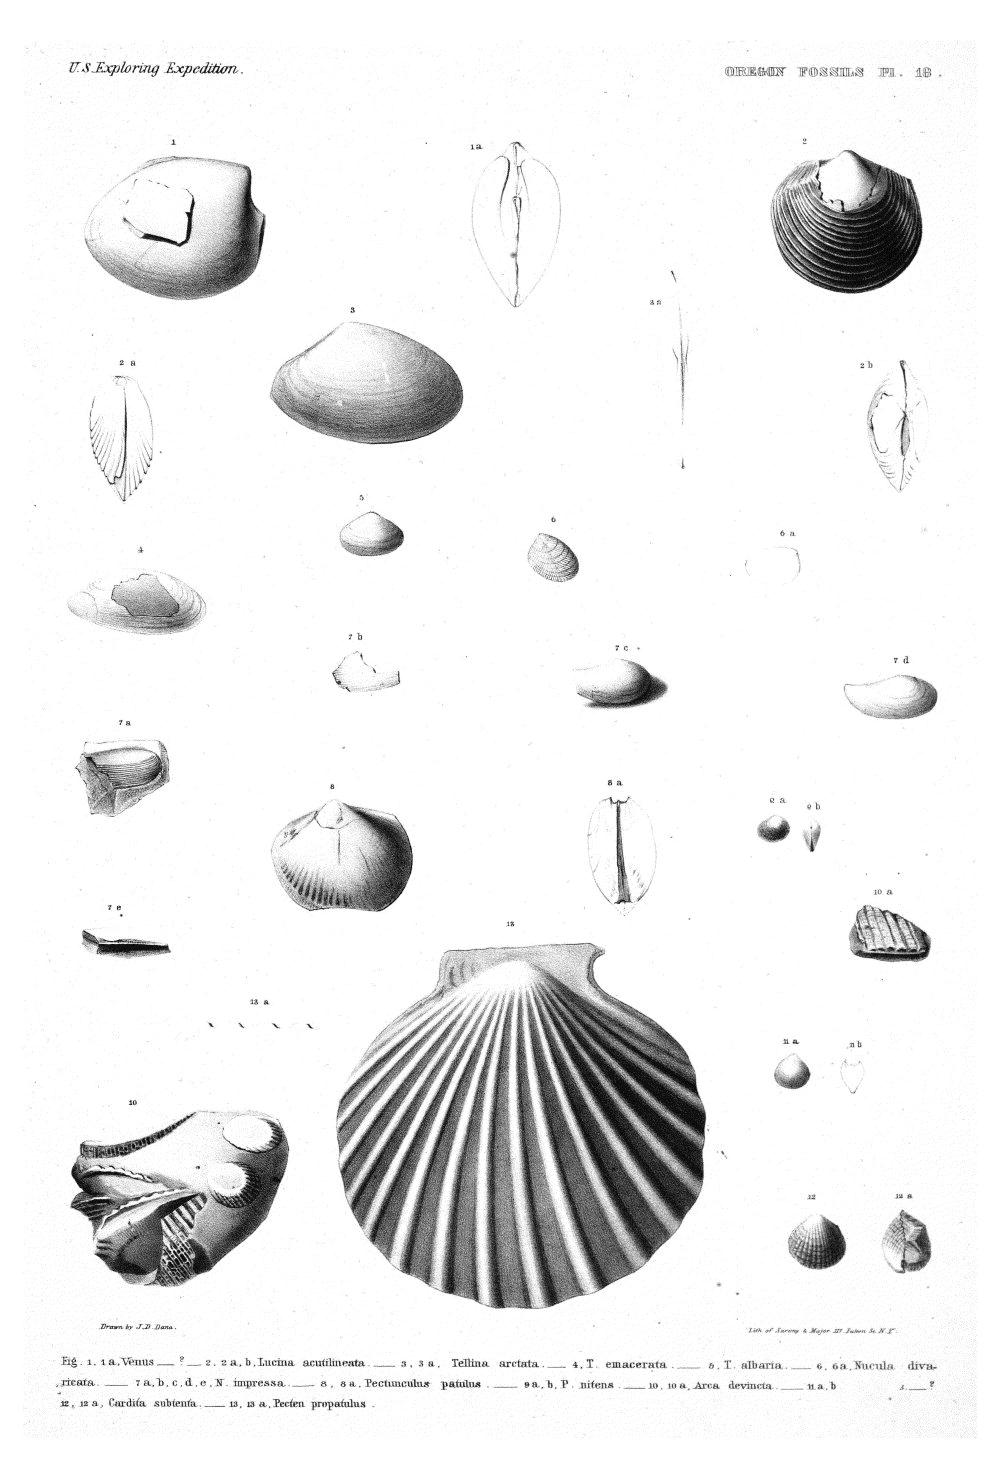 Oregon Fossils, Plate 18,  Image number:Sil19-15-024